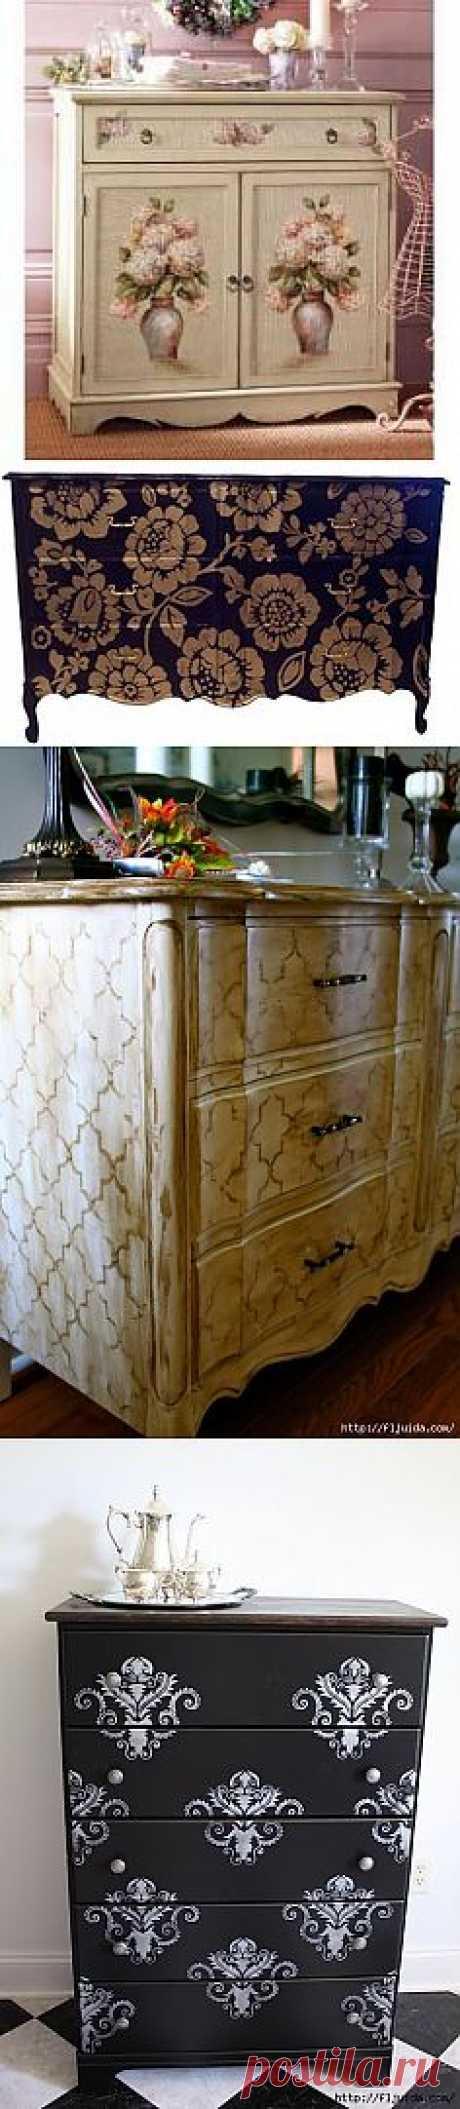 2 part. Smart furniture alterations.